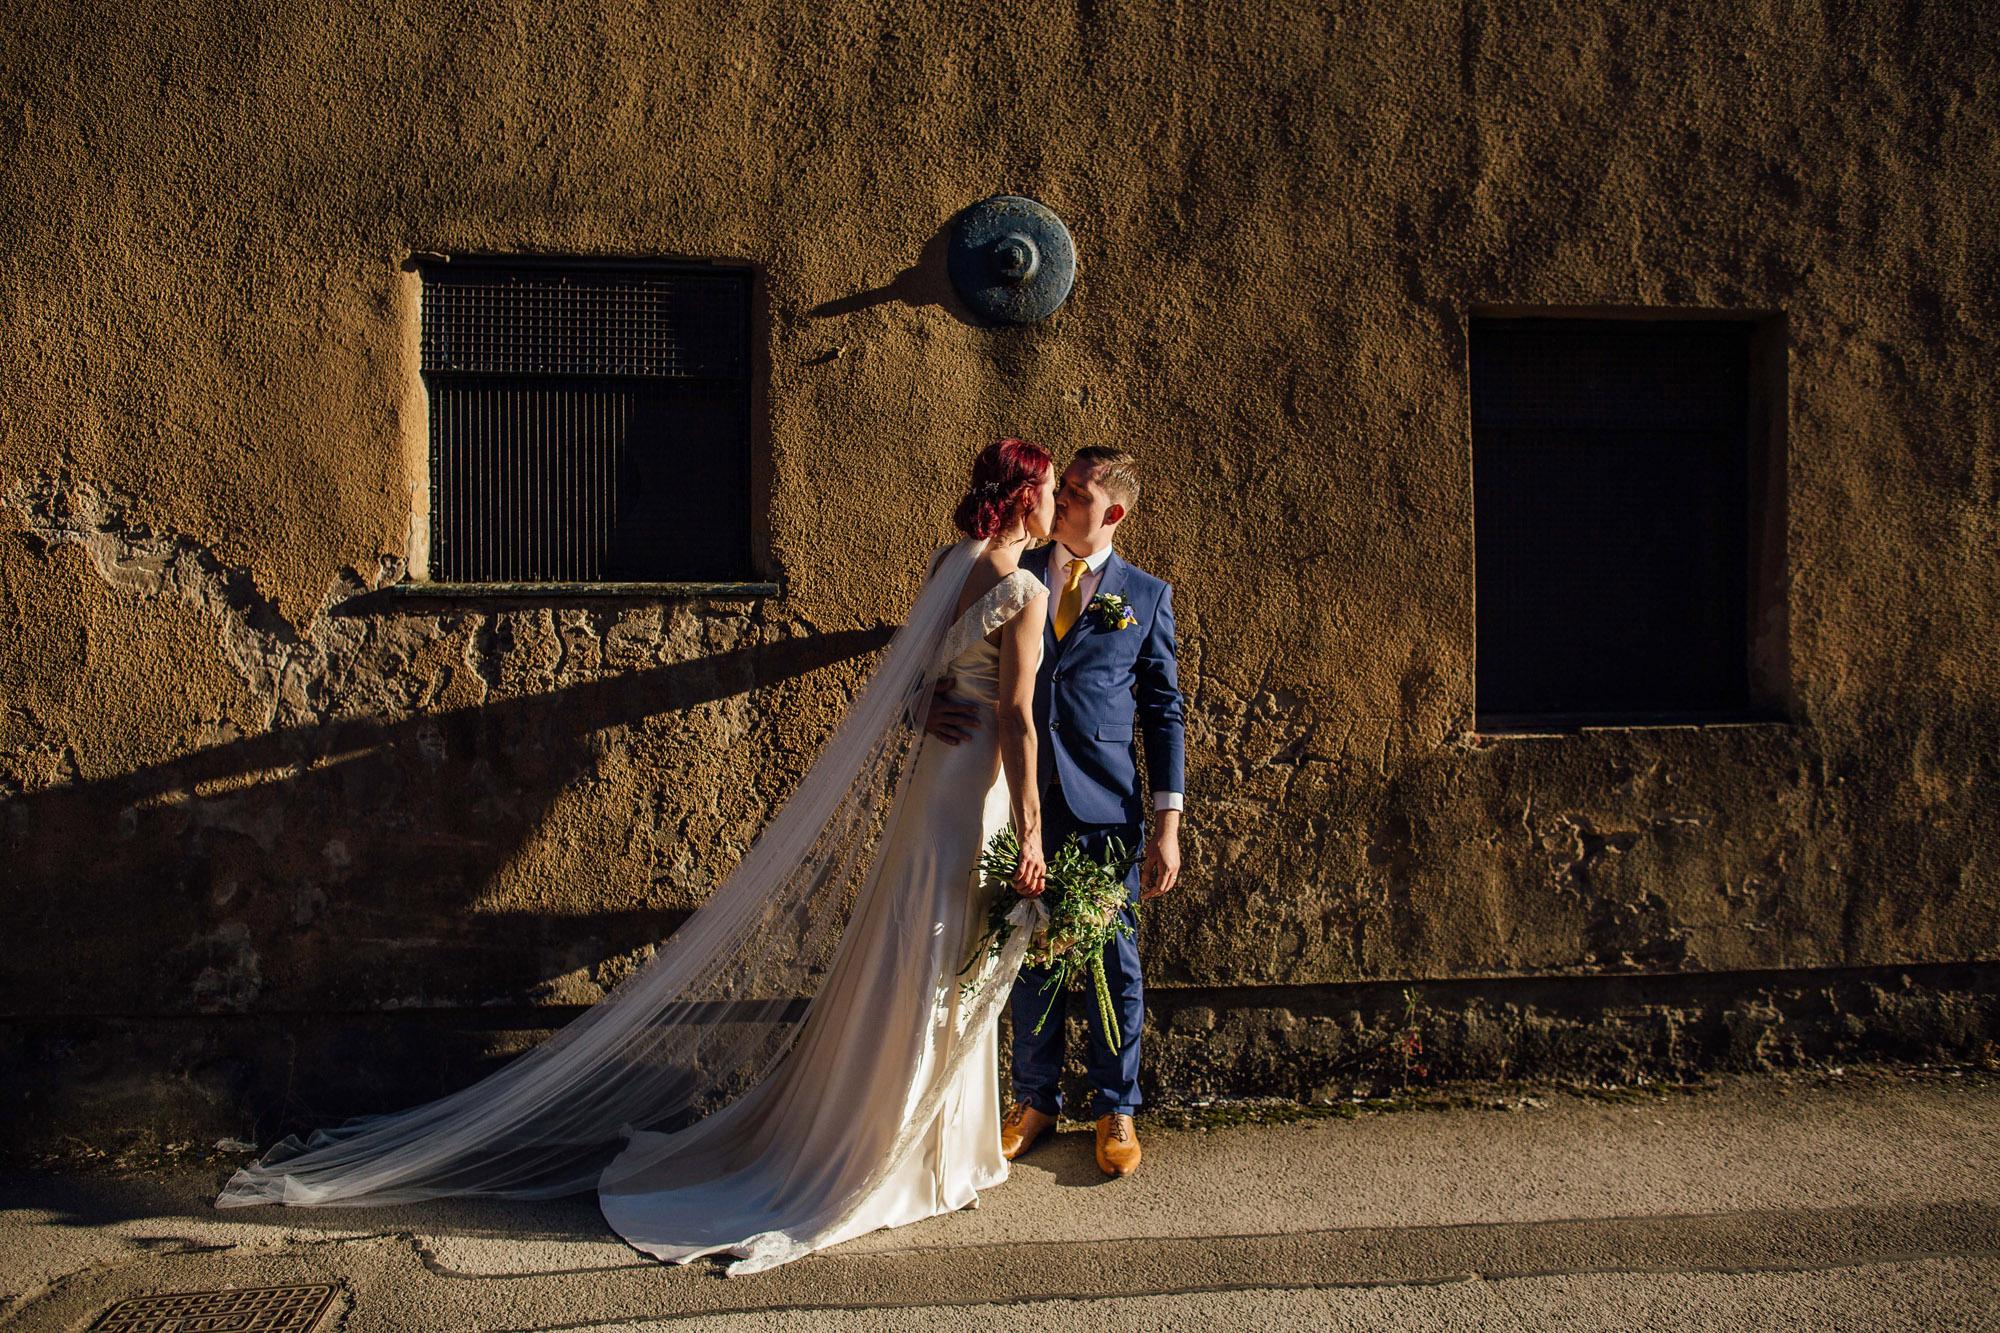 Sarah-Honeysuckle-Bias-Cut-Silk-Vintage-Inspired-Wedding-Gown-Sheffield-Wedding-Kate-Beaumont-54.jpg